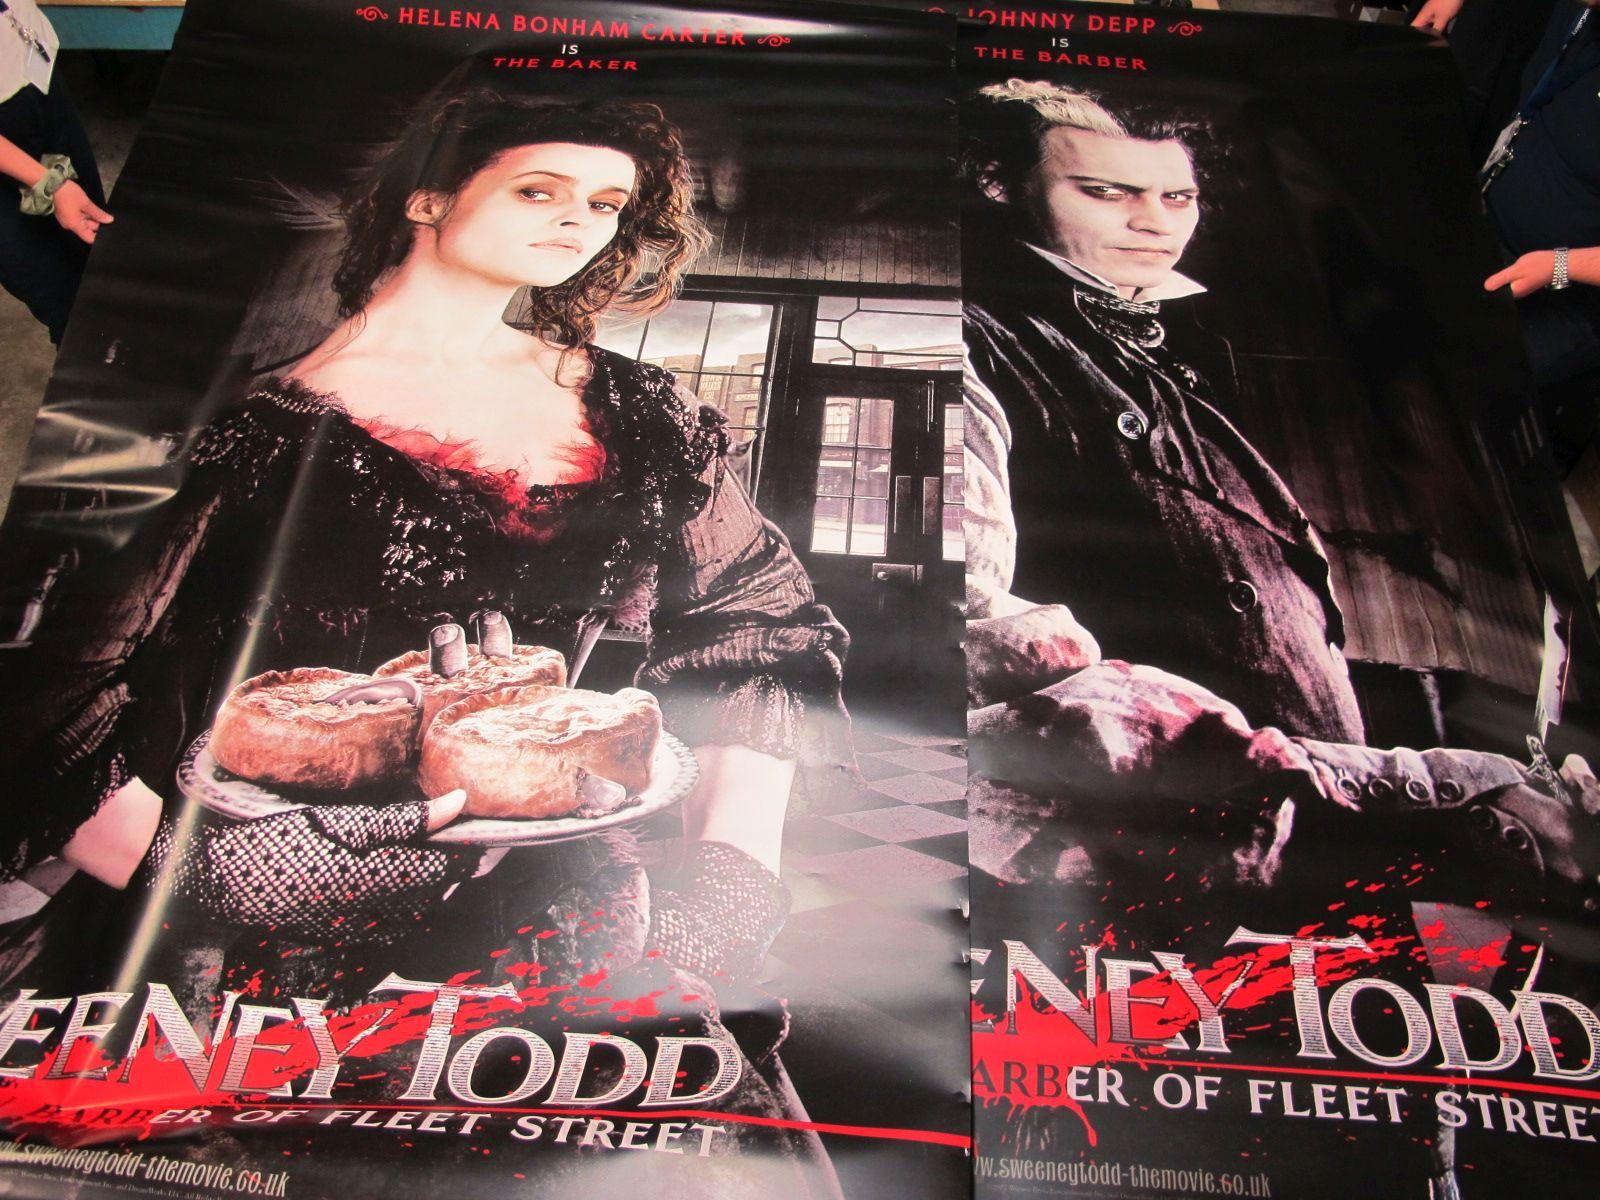 Sweeney Todd Large Lobby Posters, in chinemas January 2008, featuring Johnny Depp, Helena Bonham